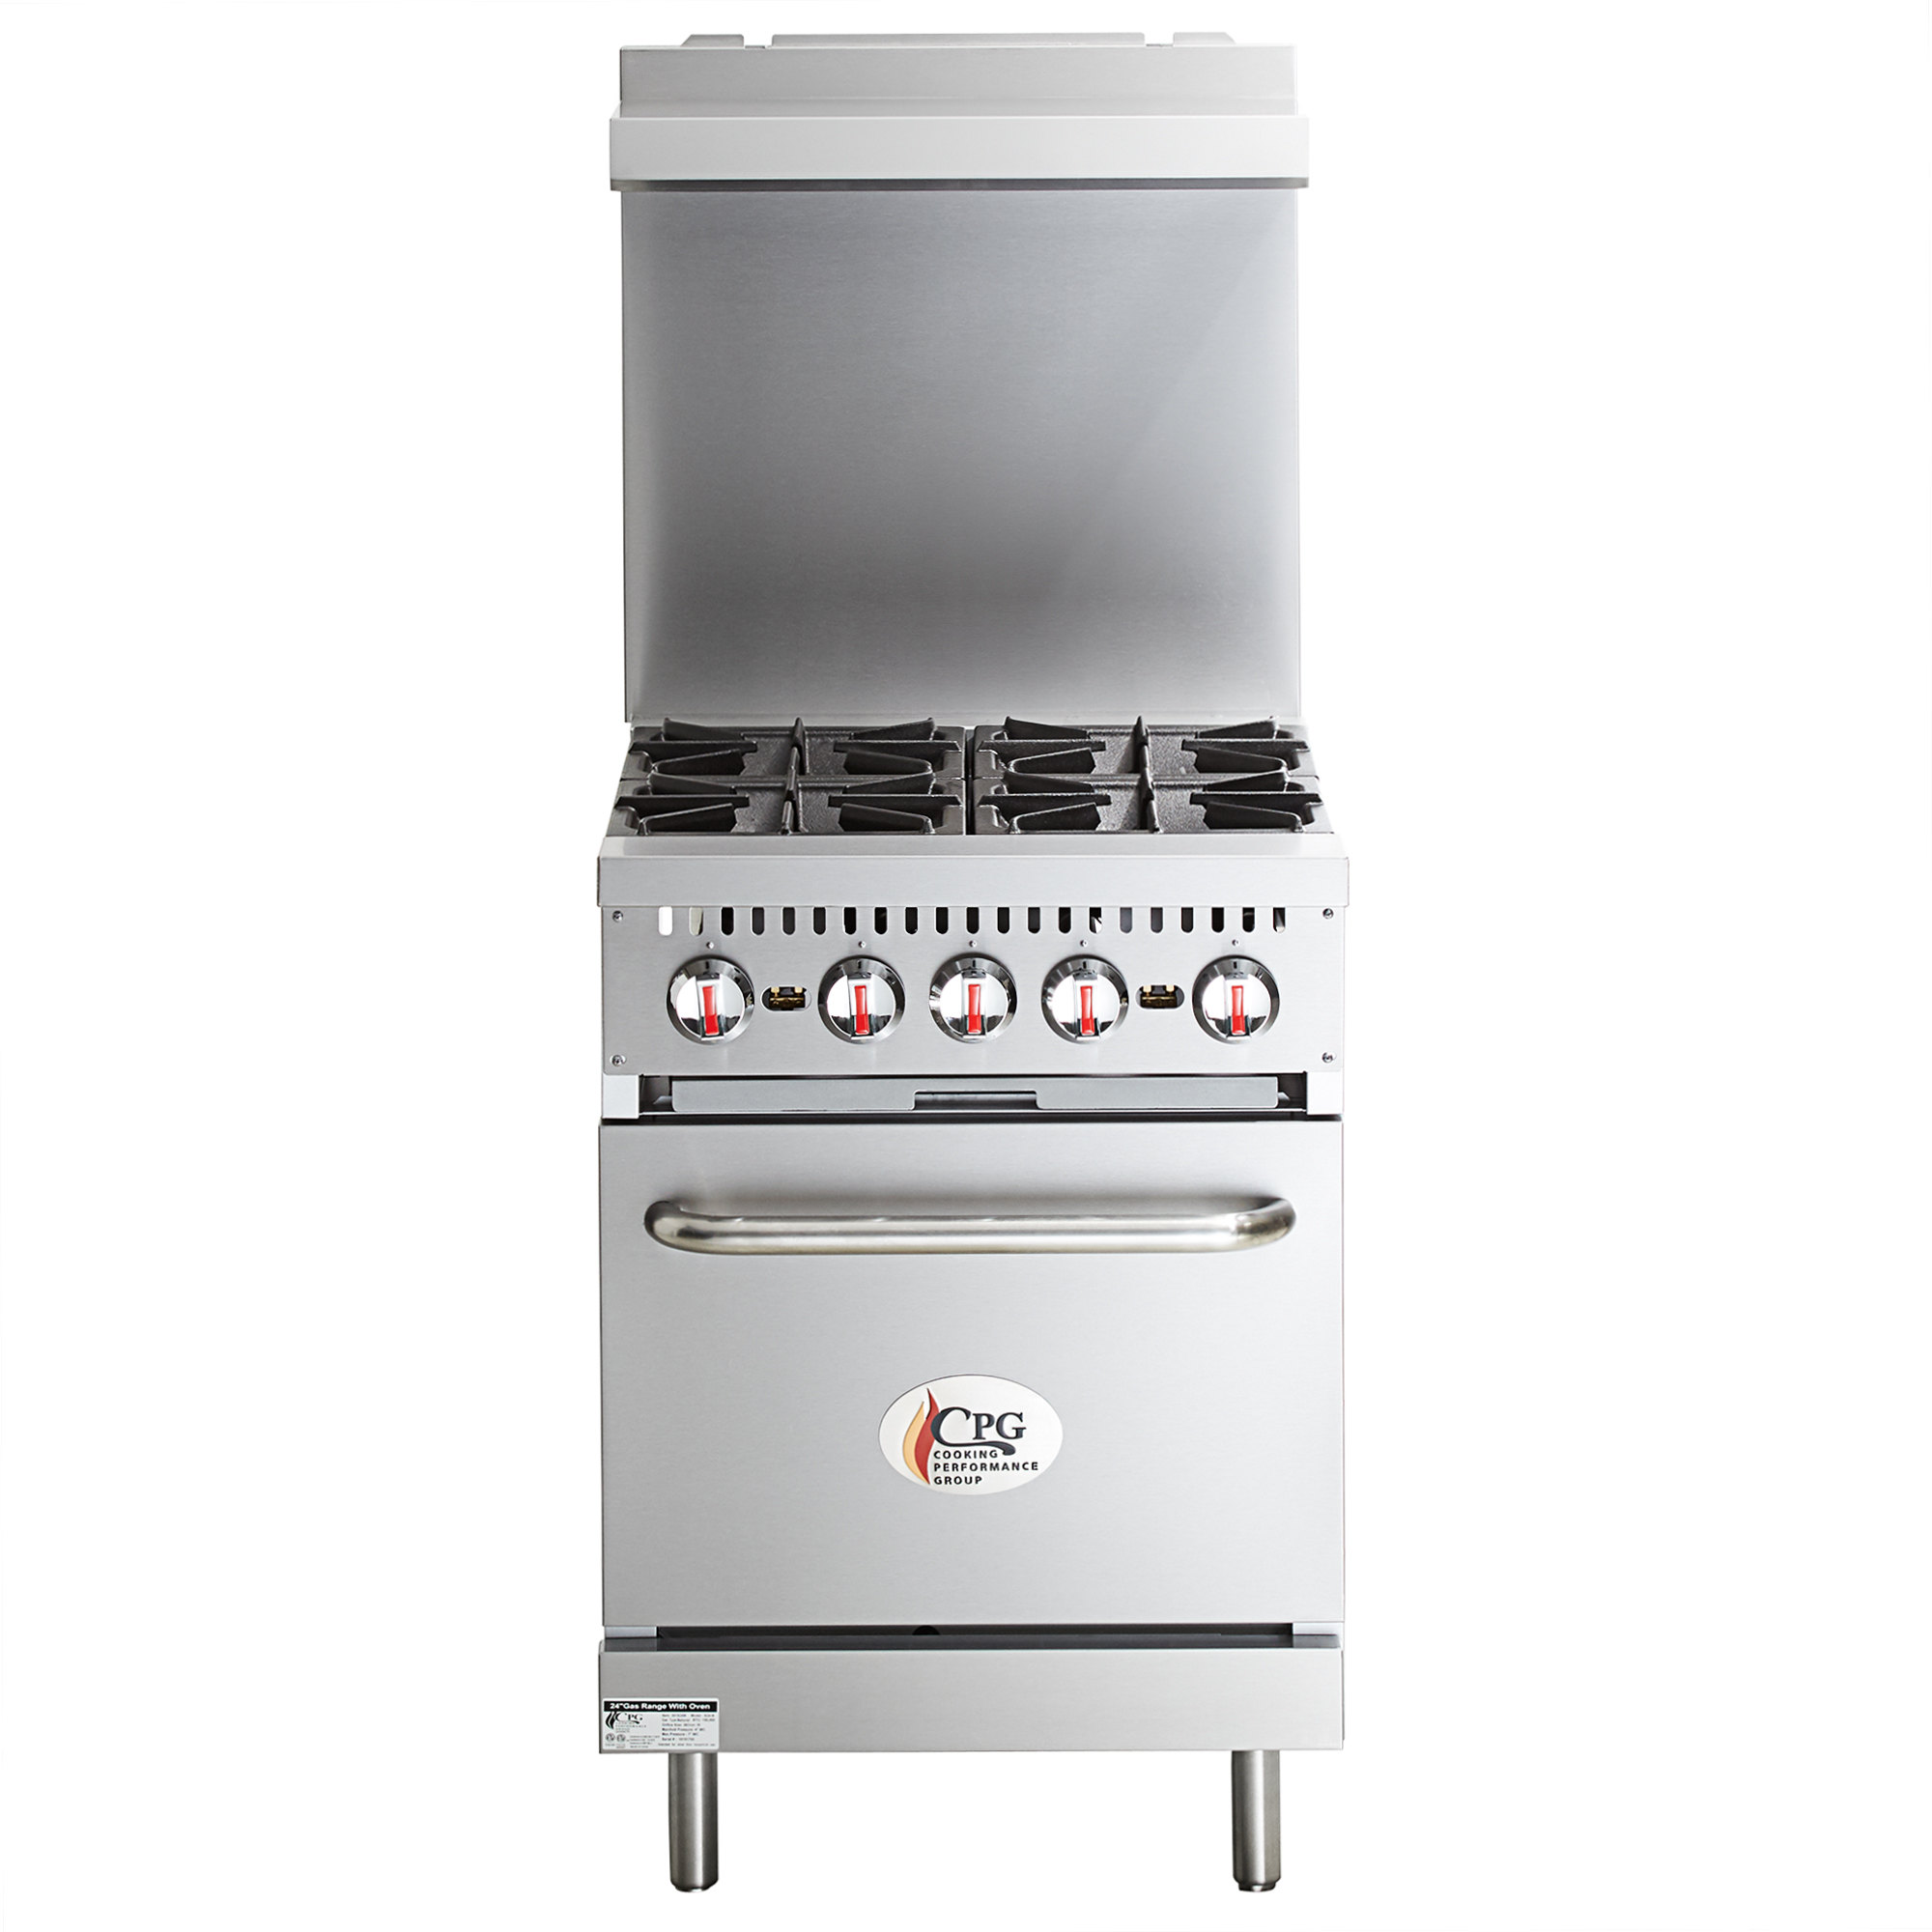 Cooking Performance Group S24-N Natural Gas 4 Burner 24